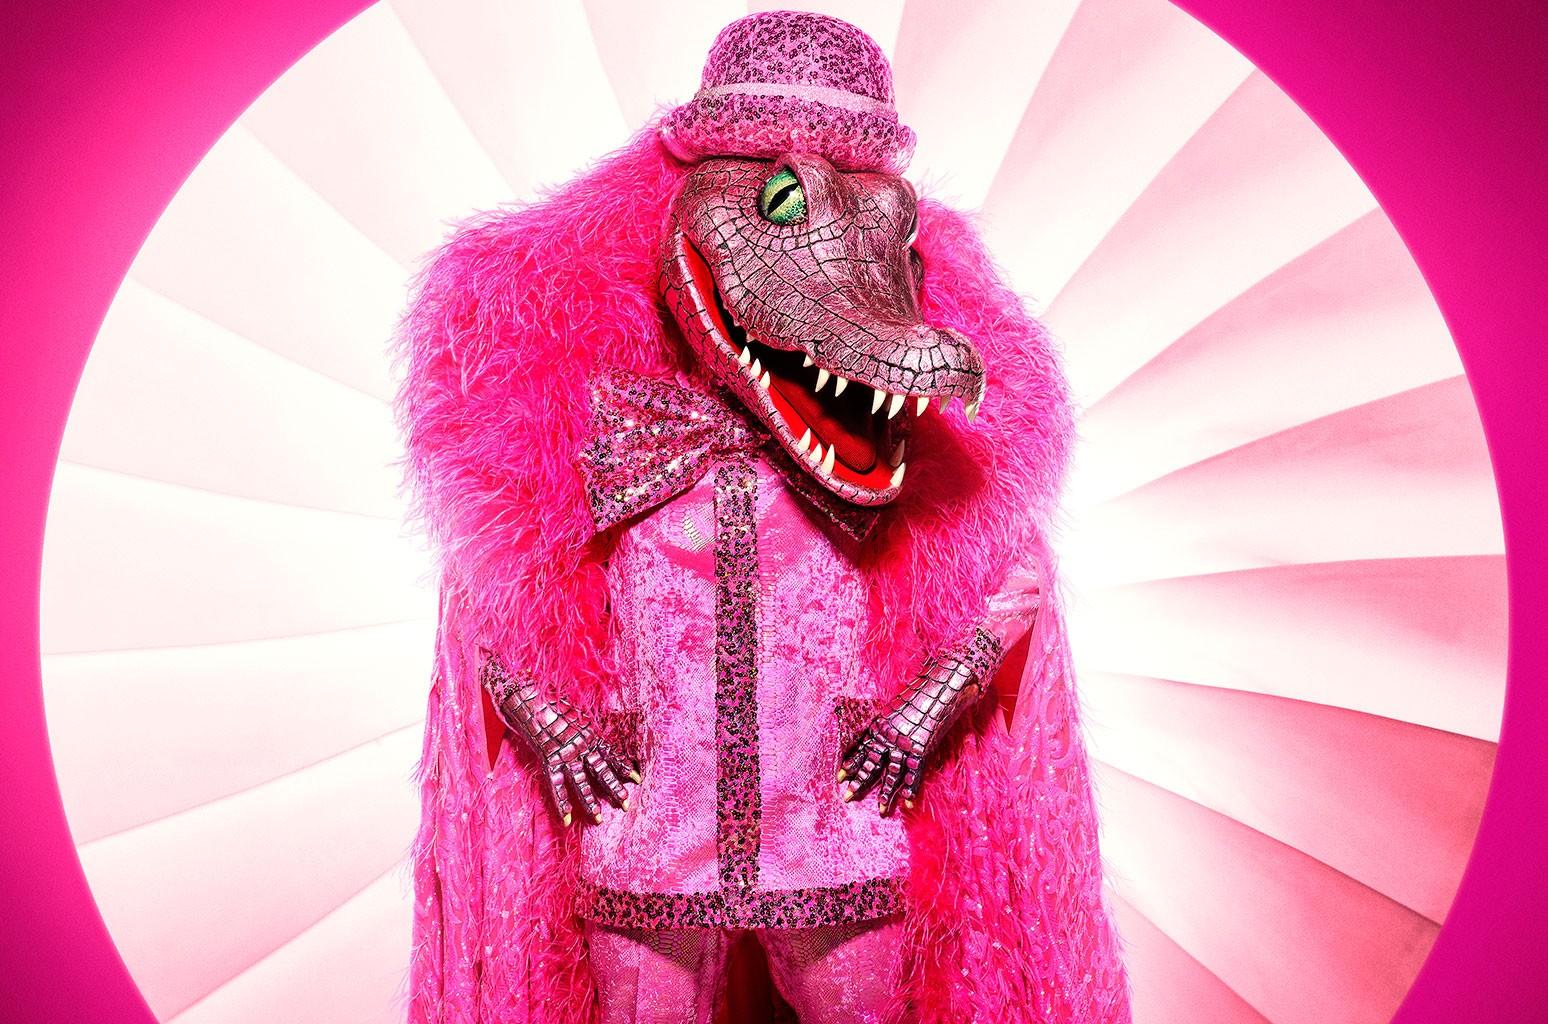 THE MASKED SINGER: Crocodile.